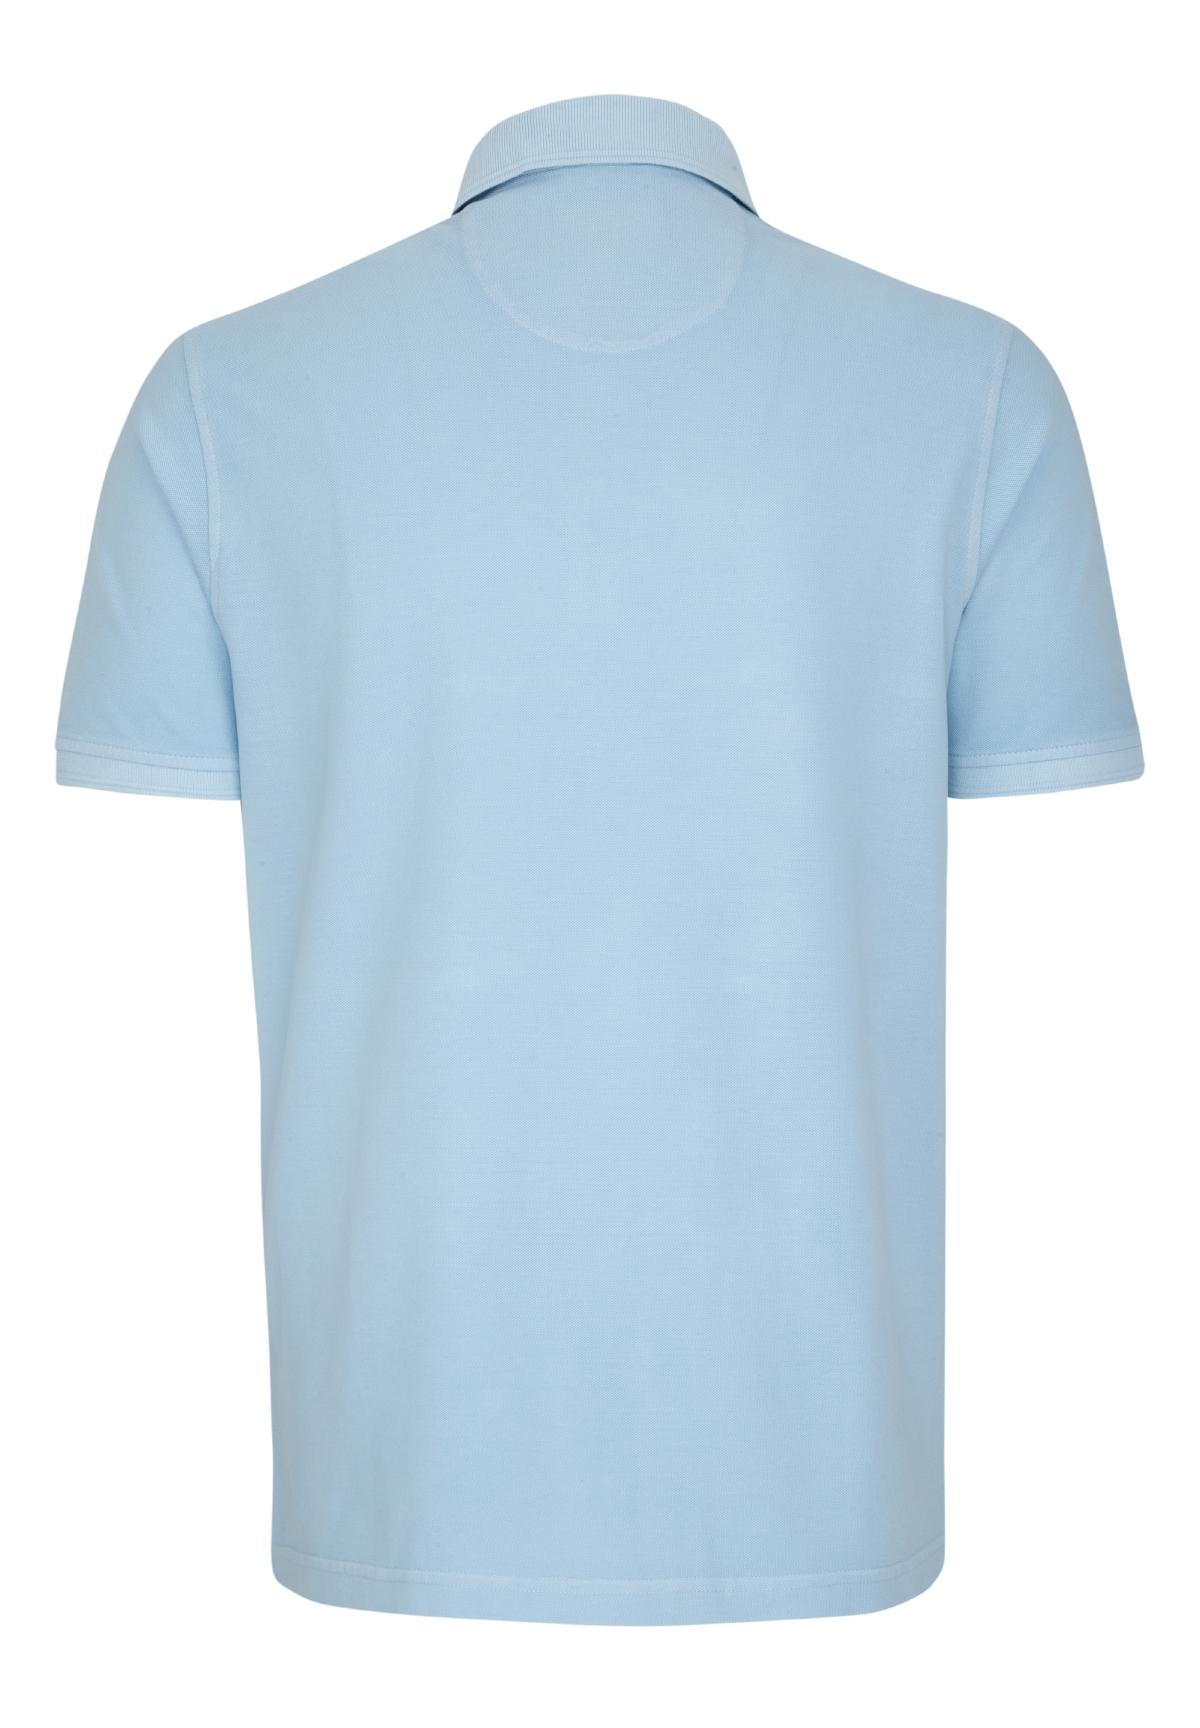 Camel-Active-Herren-Shirt-Poloshirt-Pique-Regular-Fit-NEU Indexbild 13